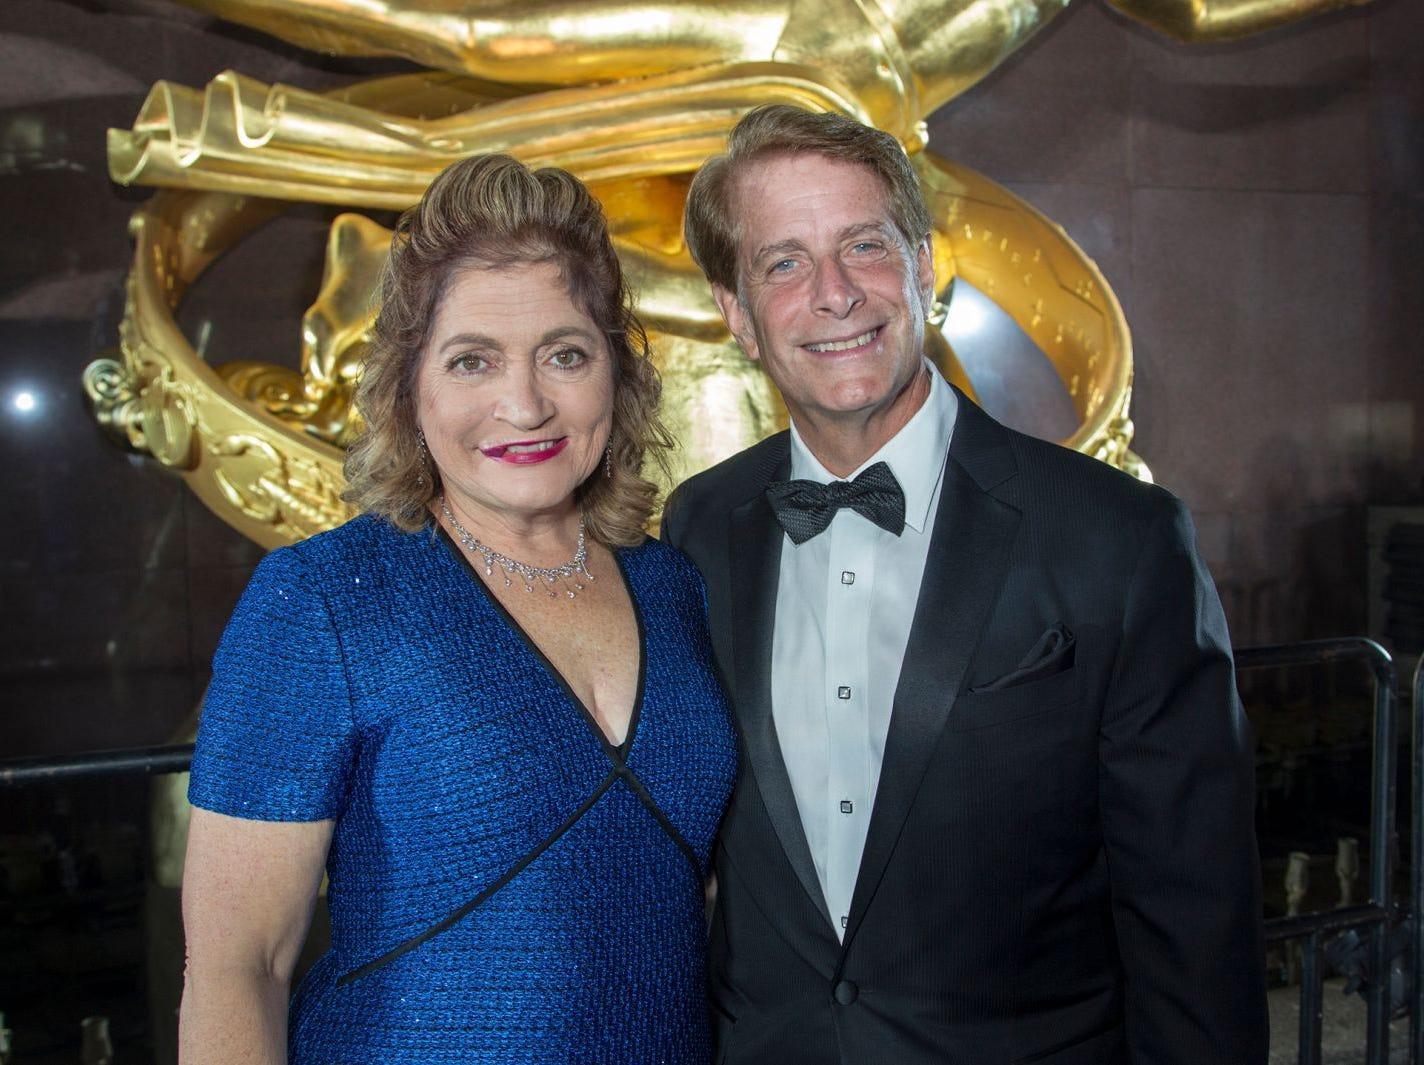 Laura and Rob Garrett. Hackensack University Medical Center Foundation held its 25th anniversary Recognition Gala at Rockefeller Center, NY. 10/06/2018